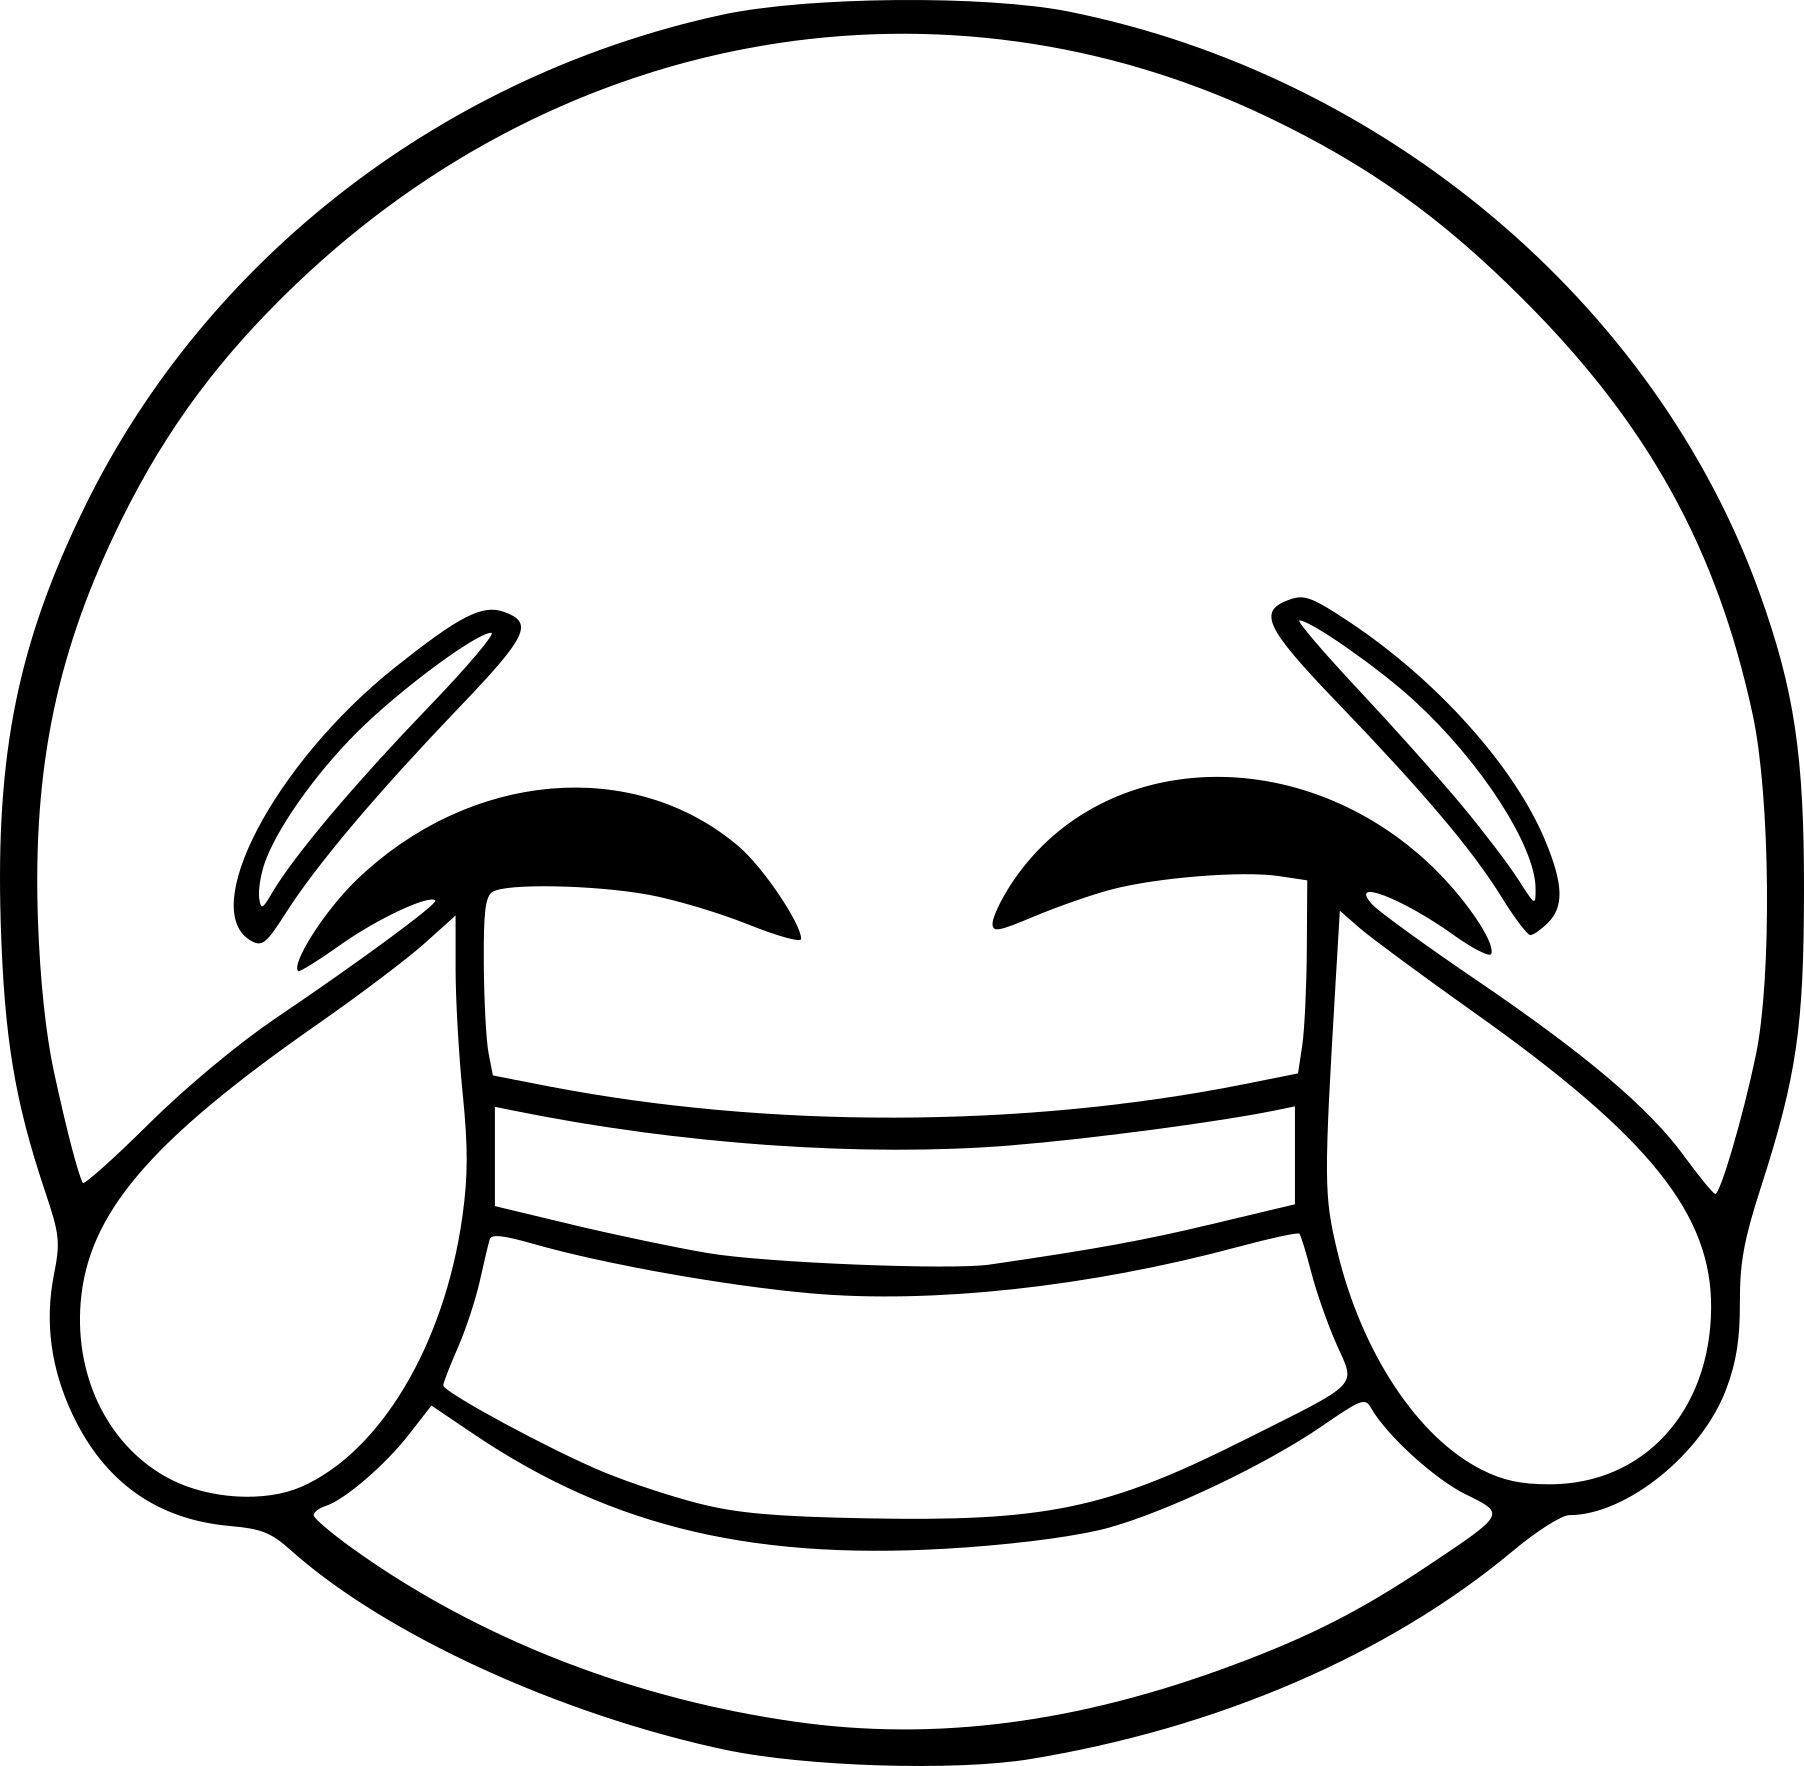 Coloriage Emoji Rire Coloriagelicorne In 2020 Emoji Coloring